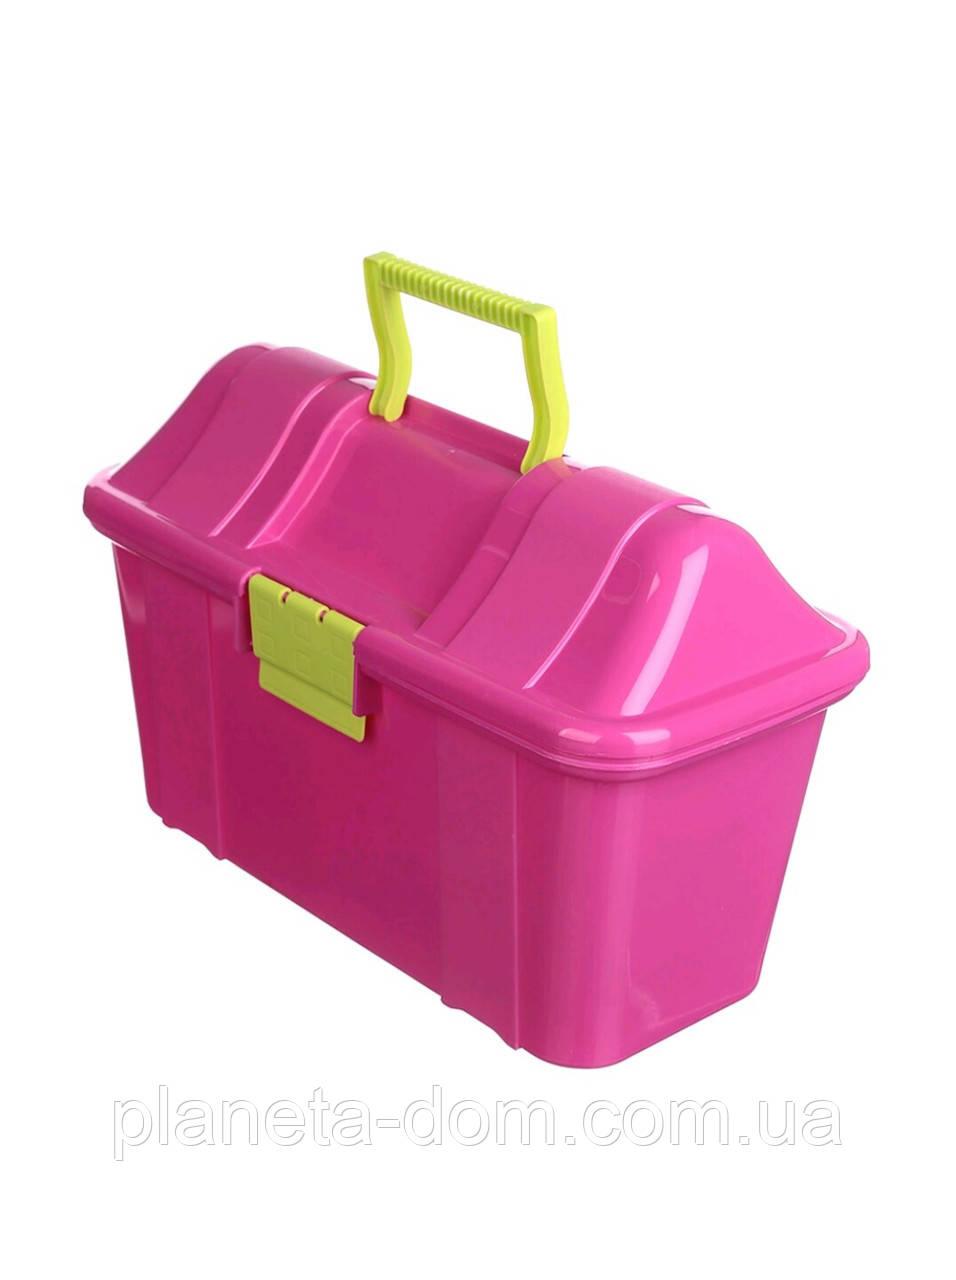 Ящик пластиковый-сундук Heidrun Boxmania 7,7л, 38,5х27,5х24см